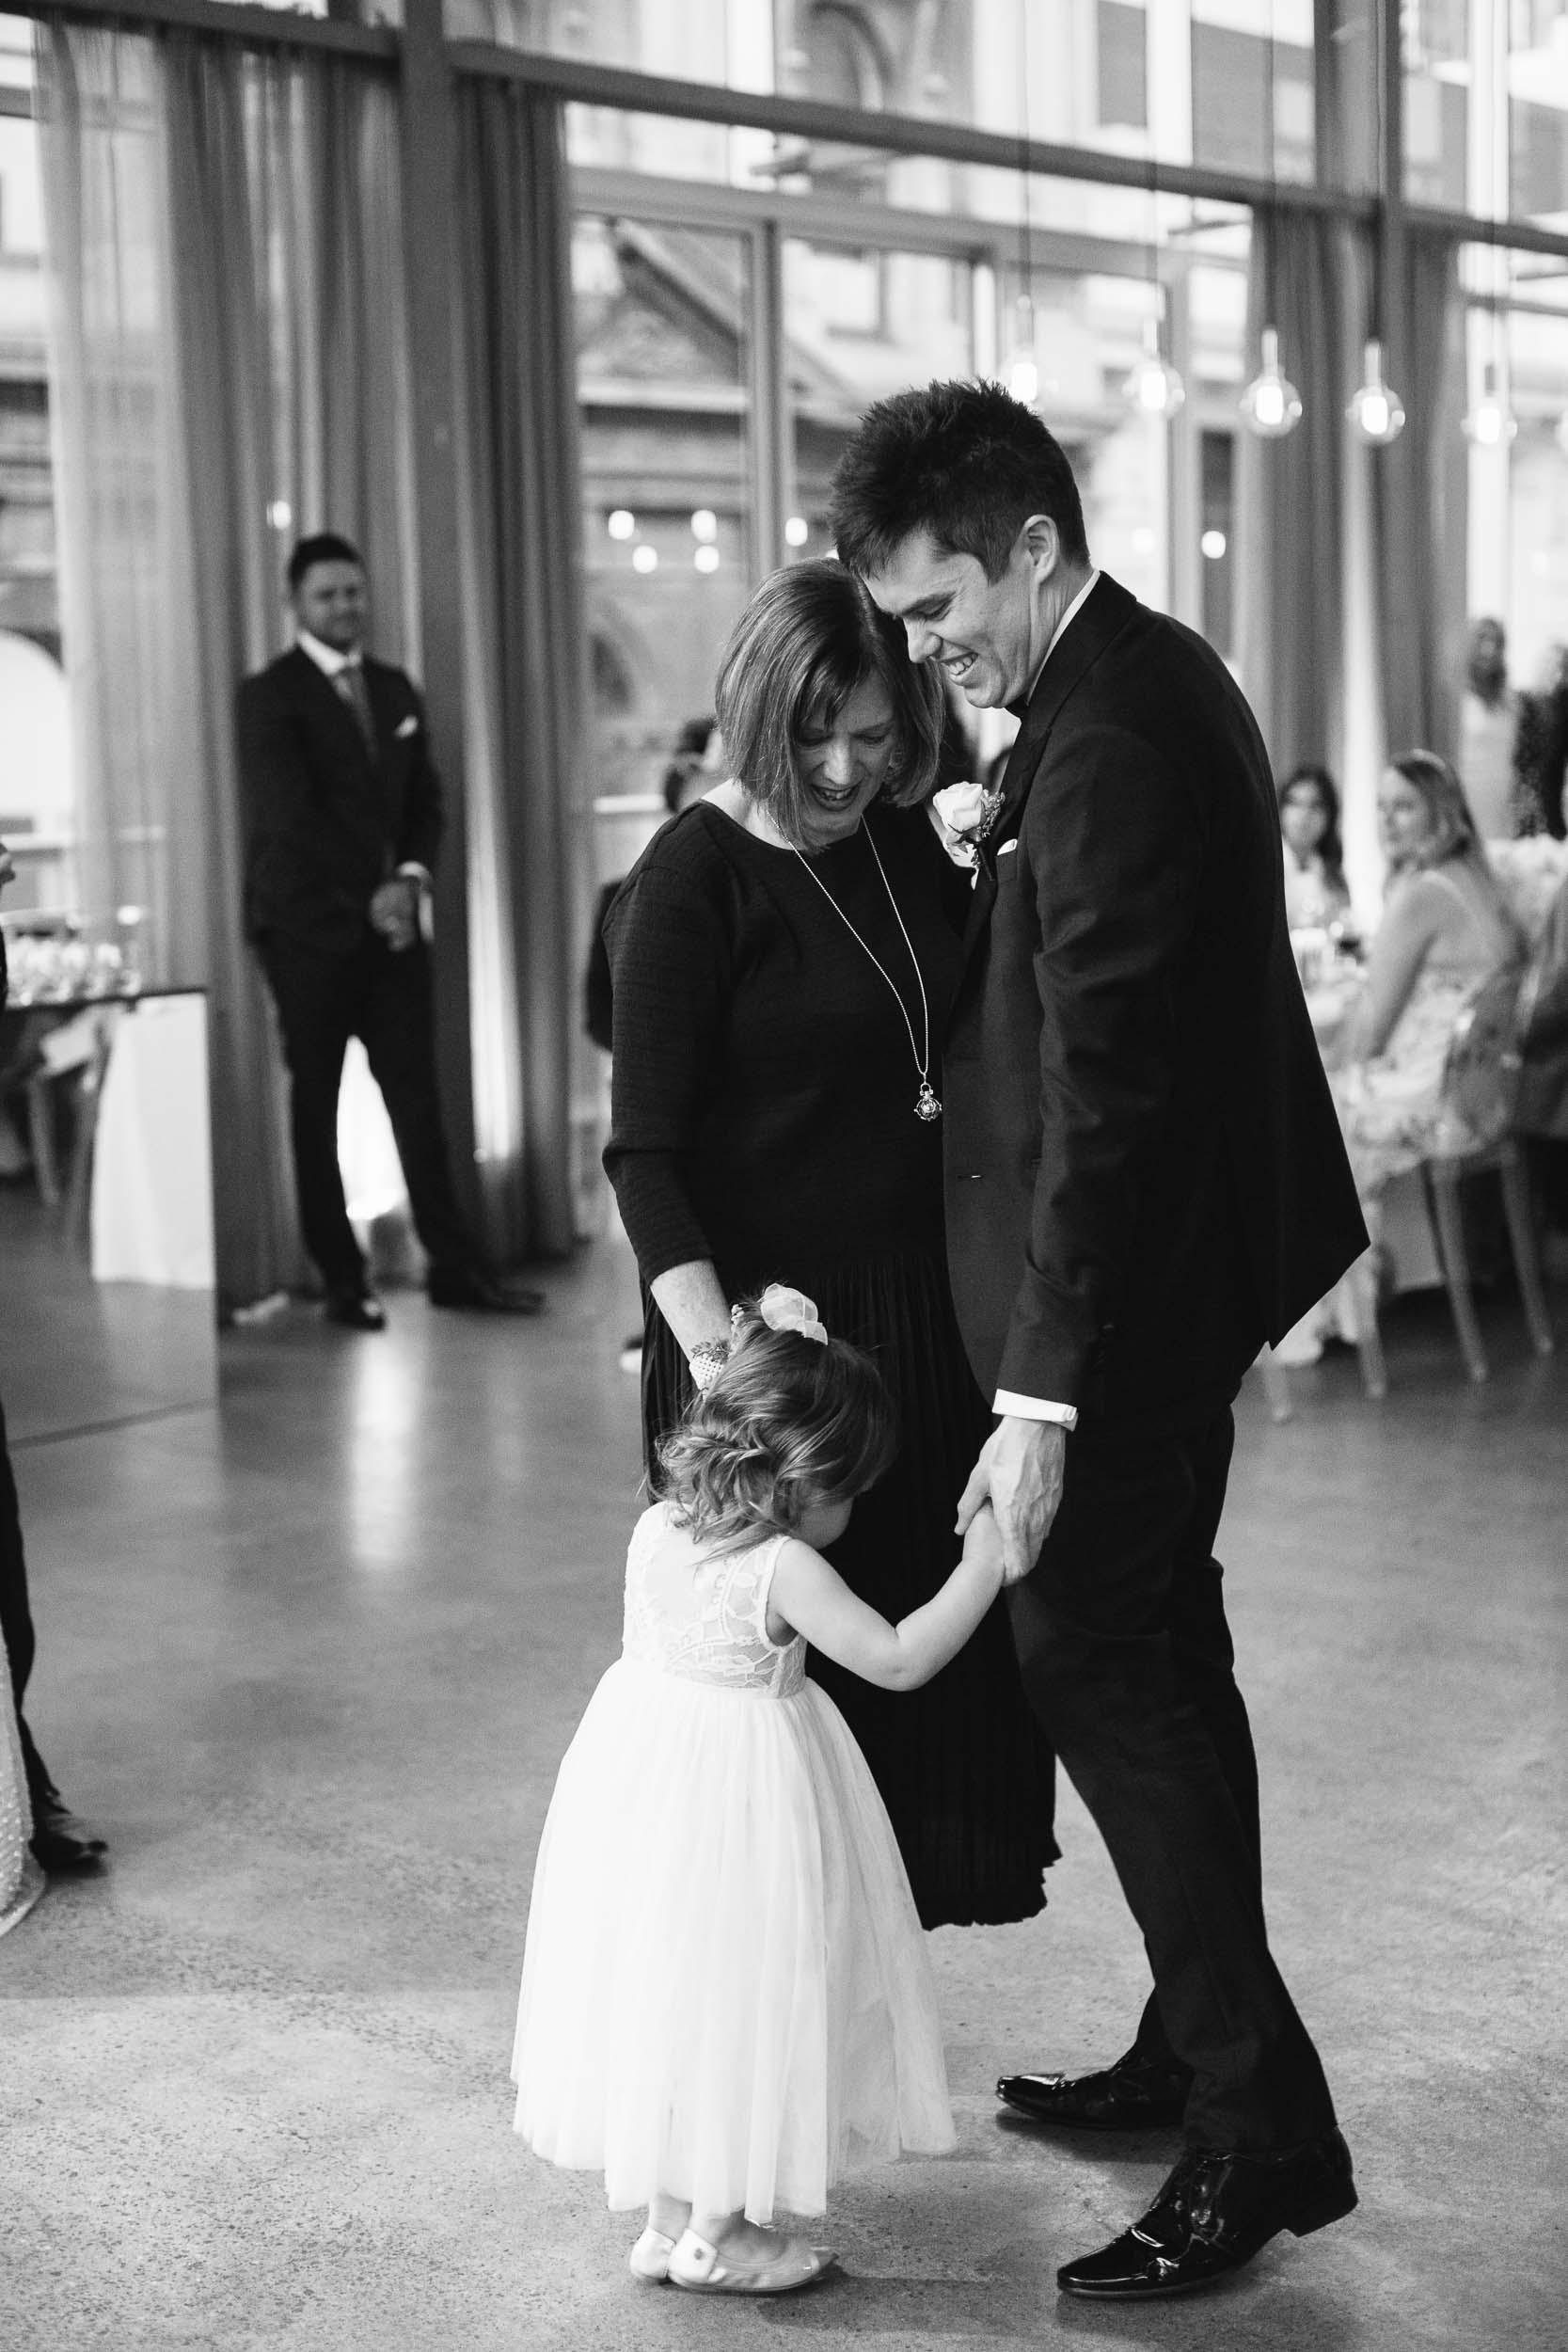 Kas-Richards-Wedding-Photographer-Melbourne-City-Wedding-Alto-Event-Space-Jane-Hill-Bridal-Gown-66.jpg